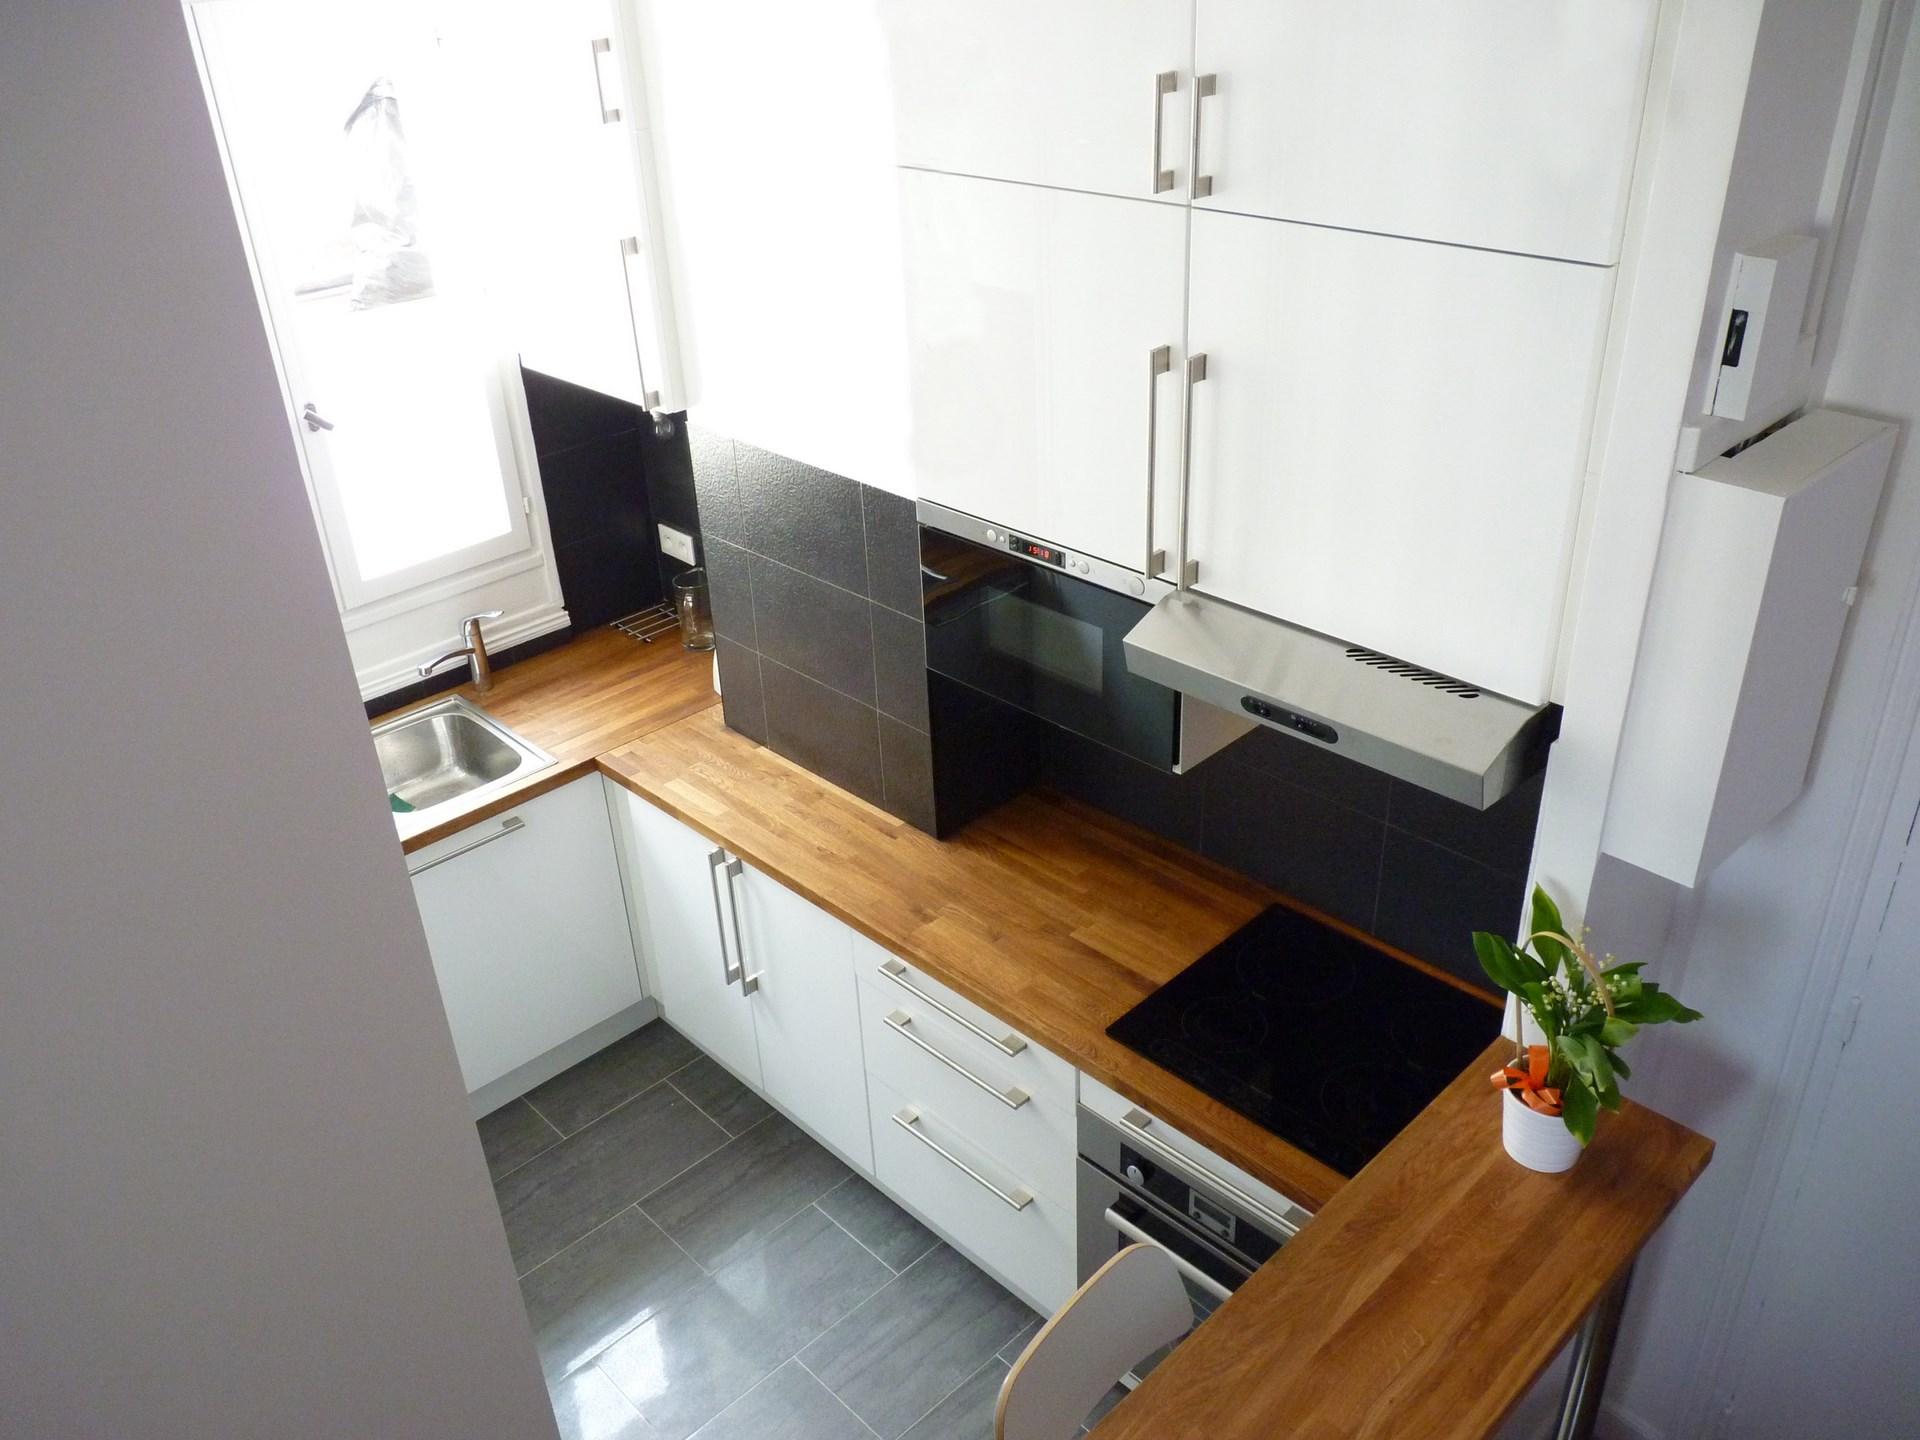 architecte interieur cuisine achitecte interieur lille achitecte interieur lille with. Black Bedroom Furniture Sets. Home Design Ideas